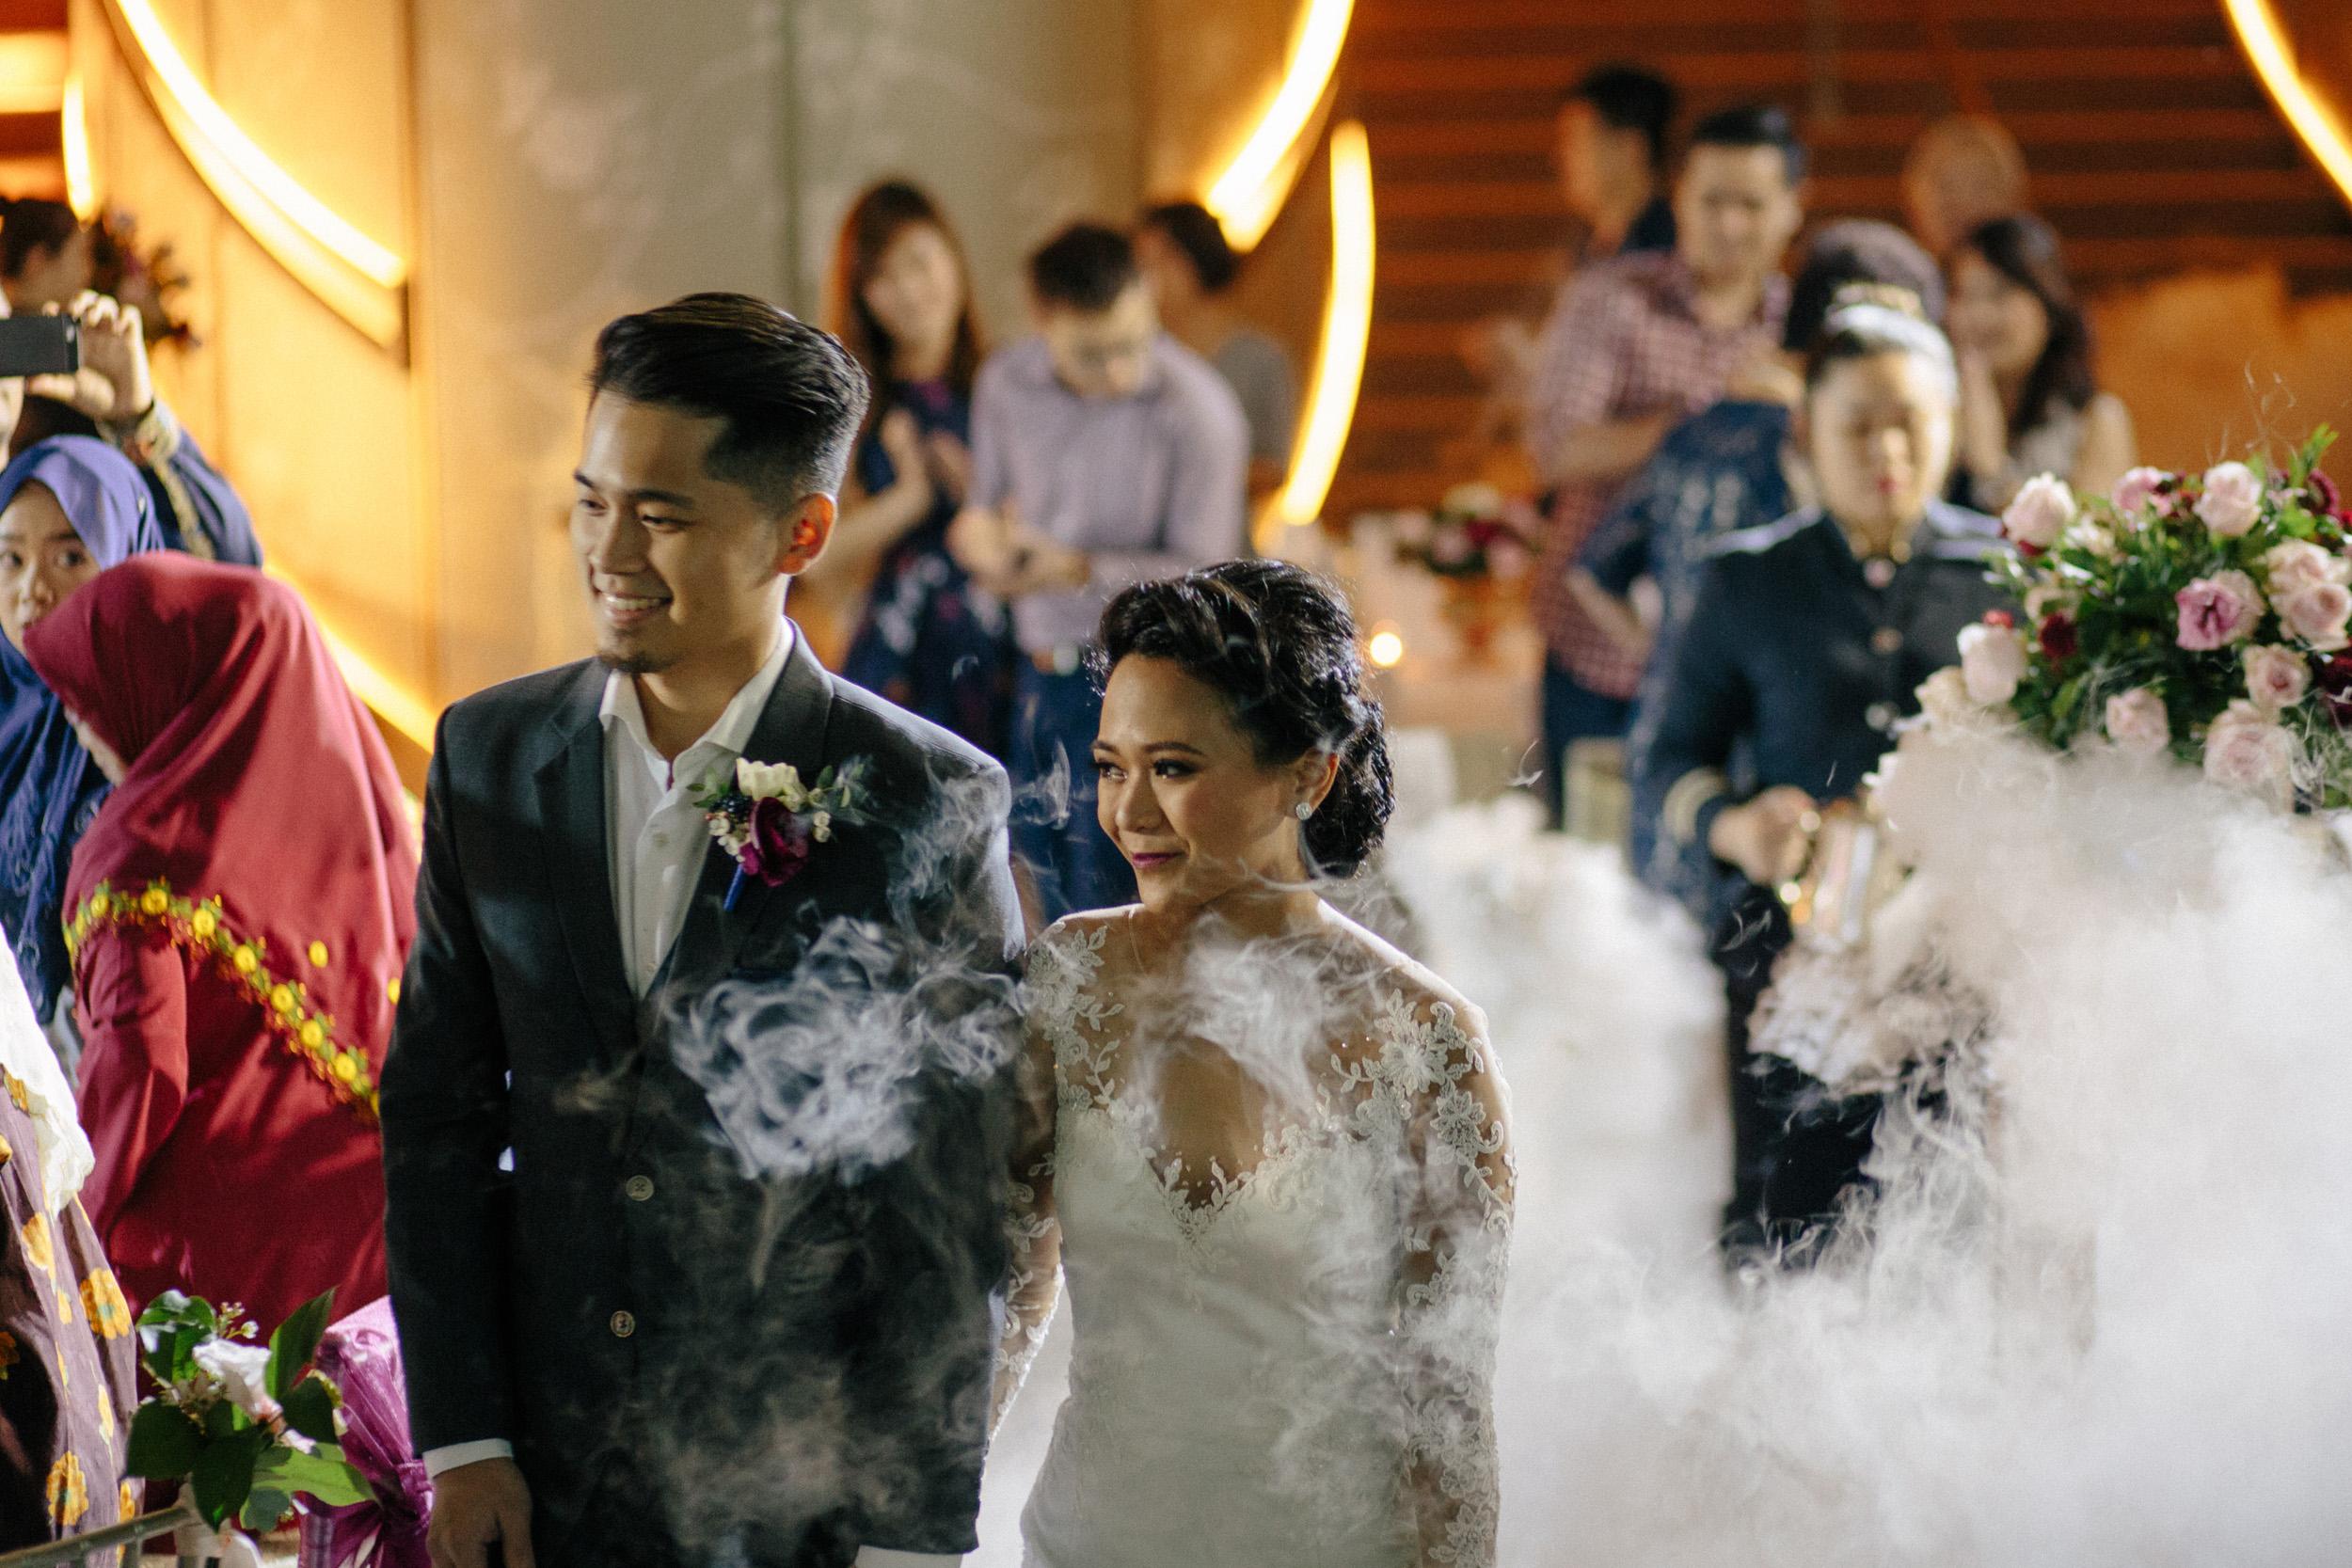 singapore-wedding-photographer-photography-wmt2017-041.jpg